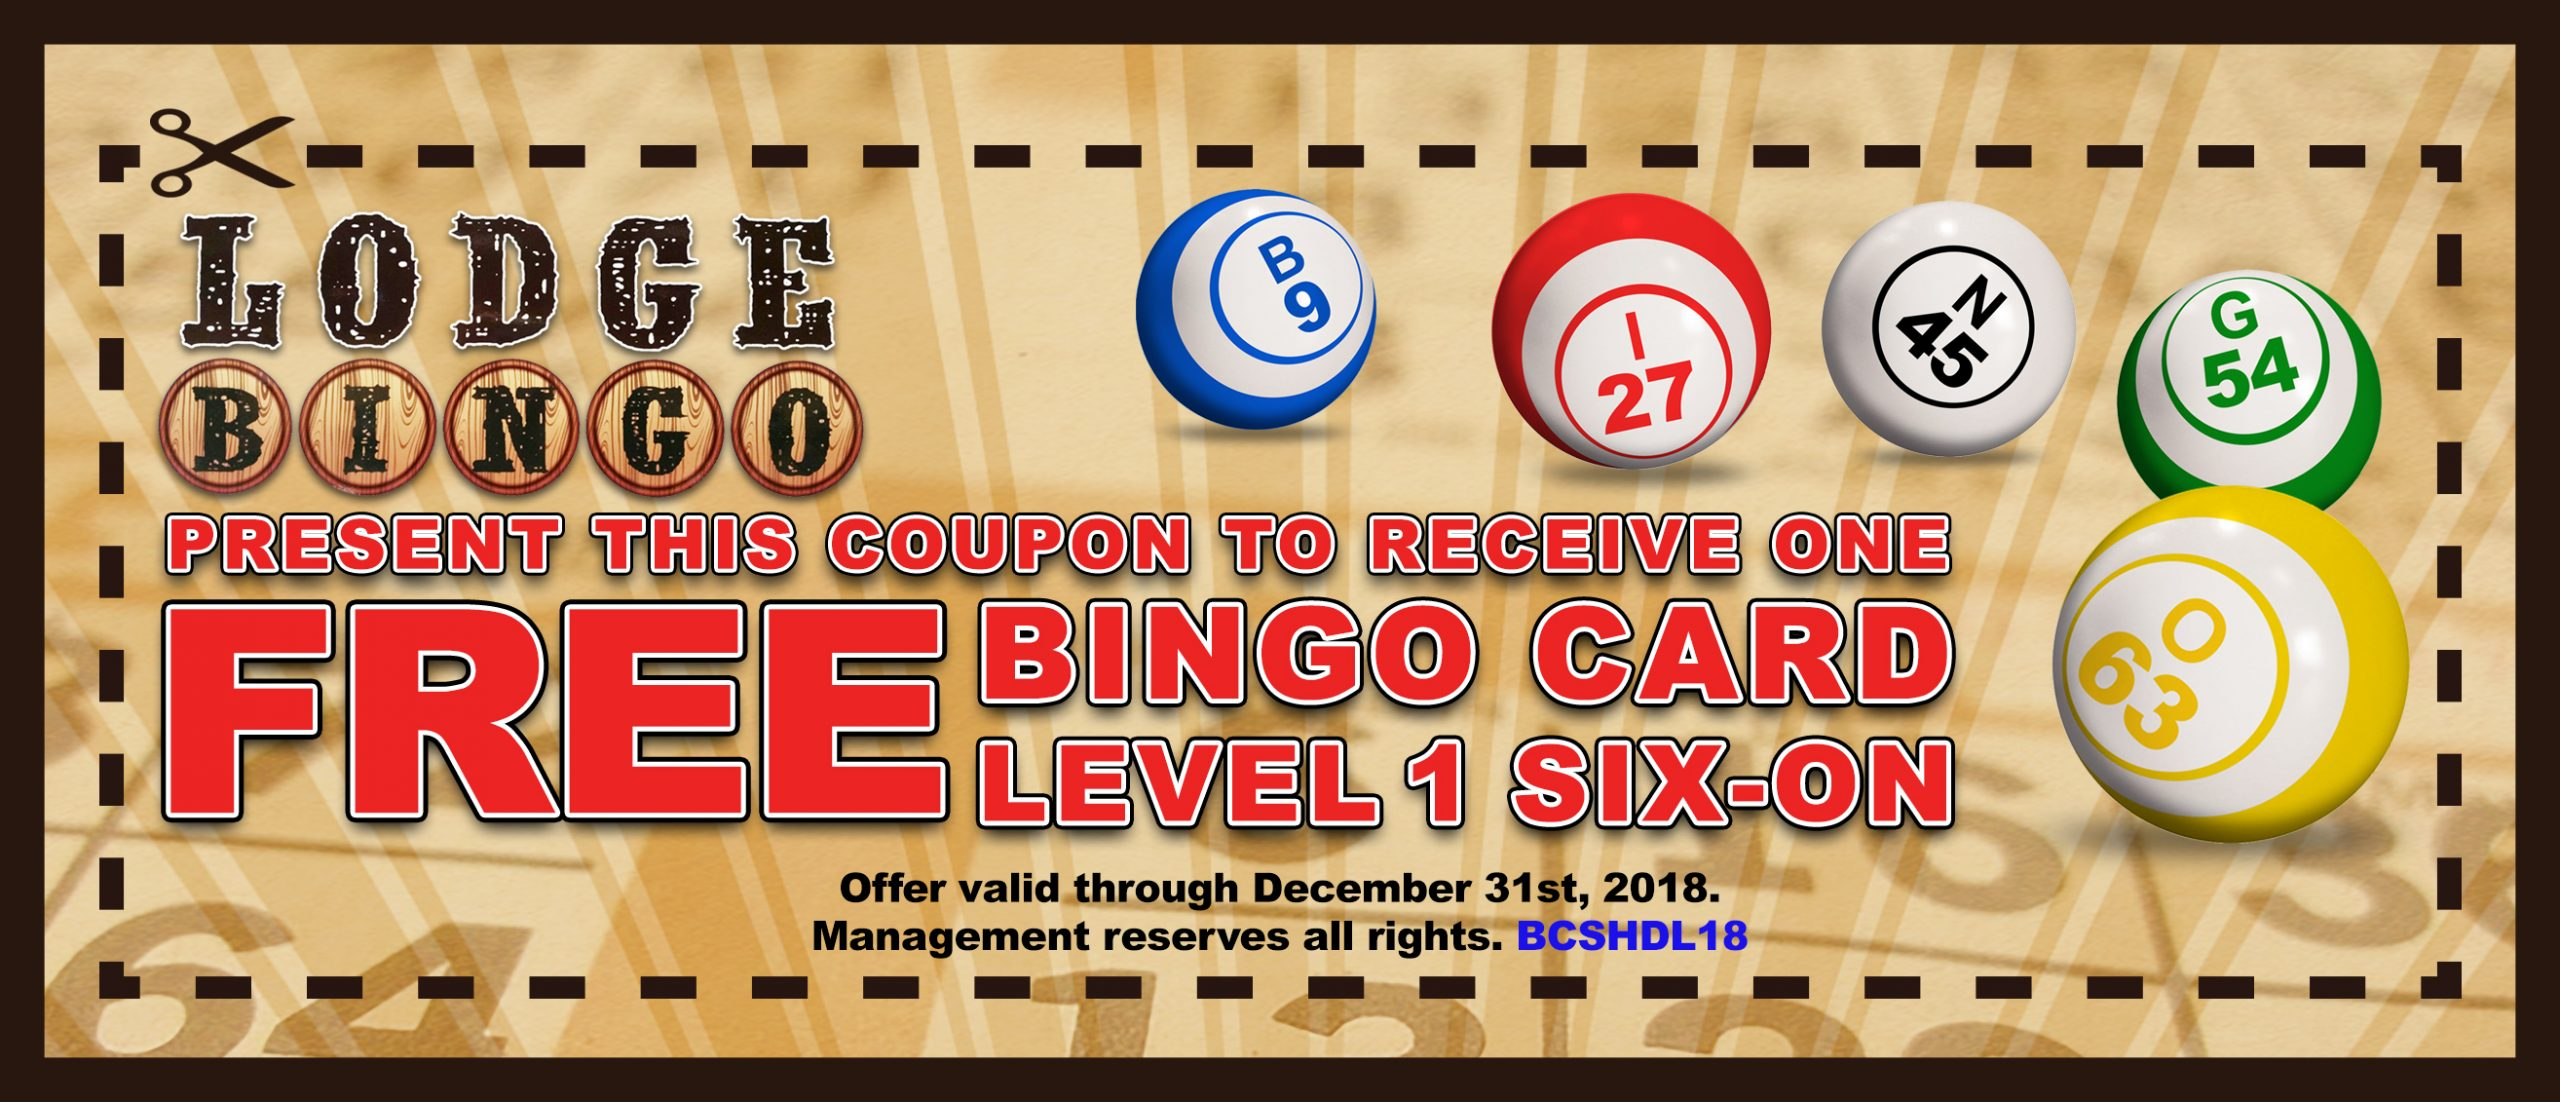 Lodge Bingo Coupon Boulder City, NV